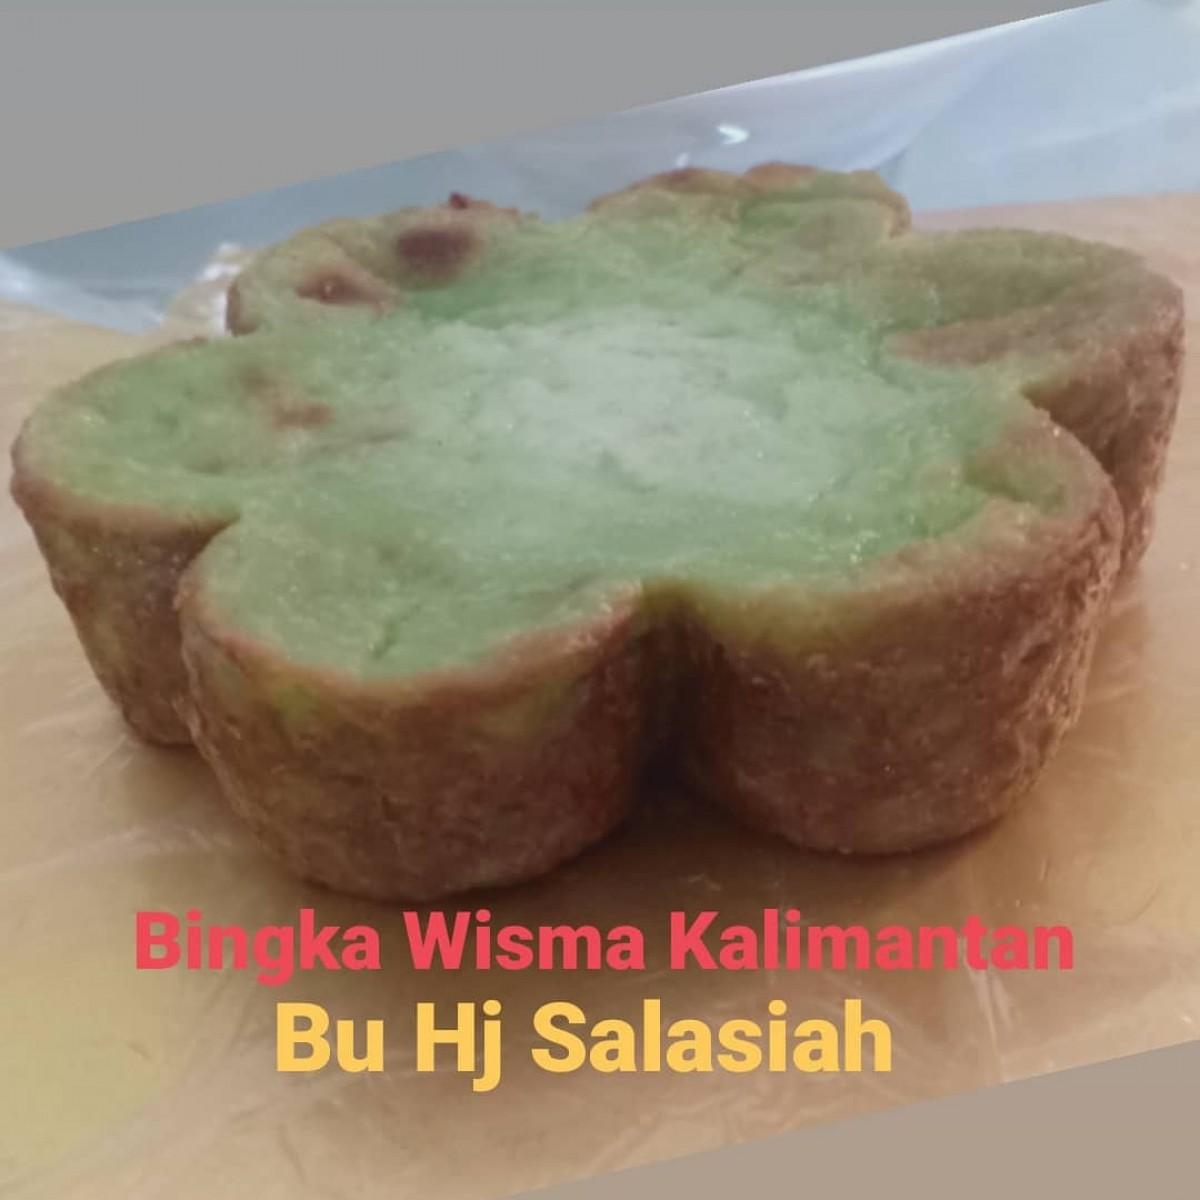 Bingka Wisma Kalimantan